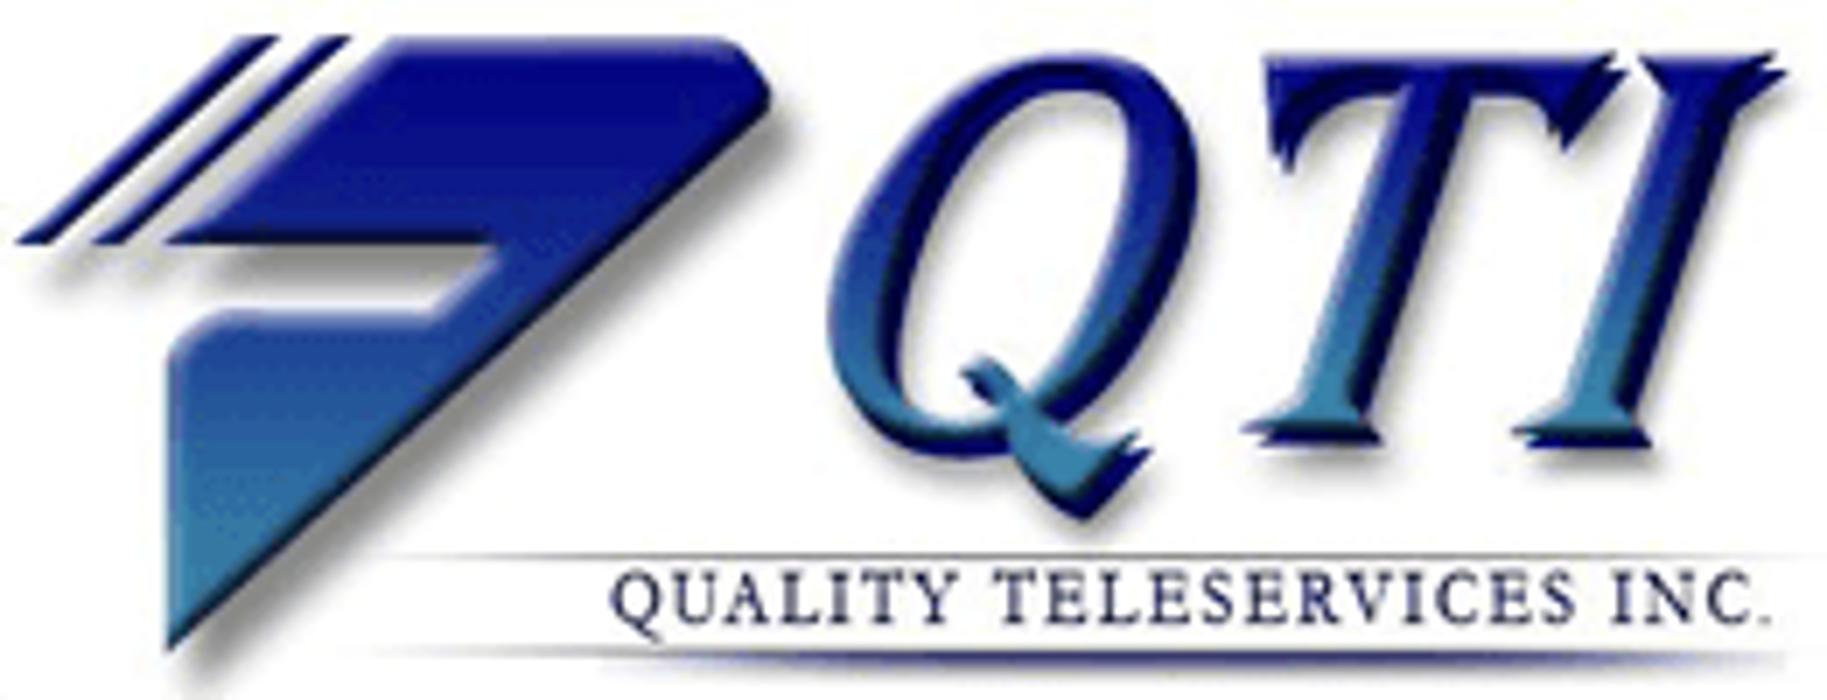 QTI - Quality Teleservices Inc.